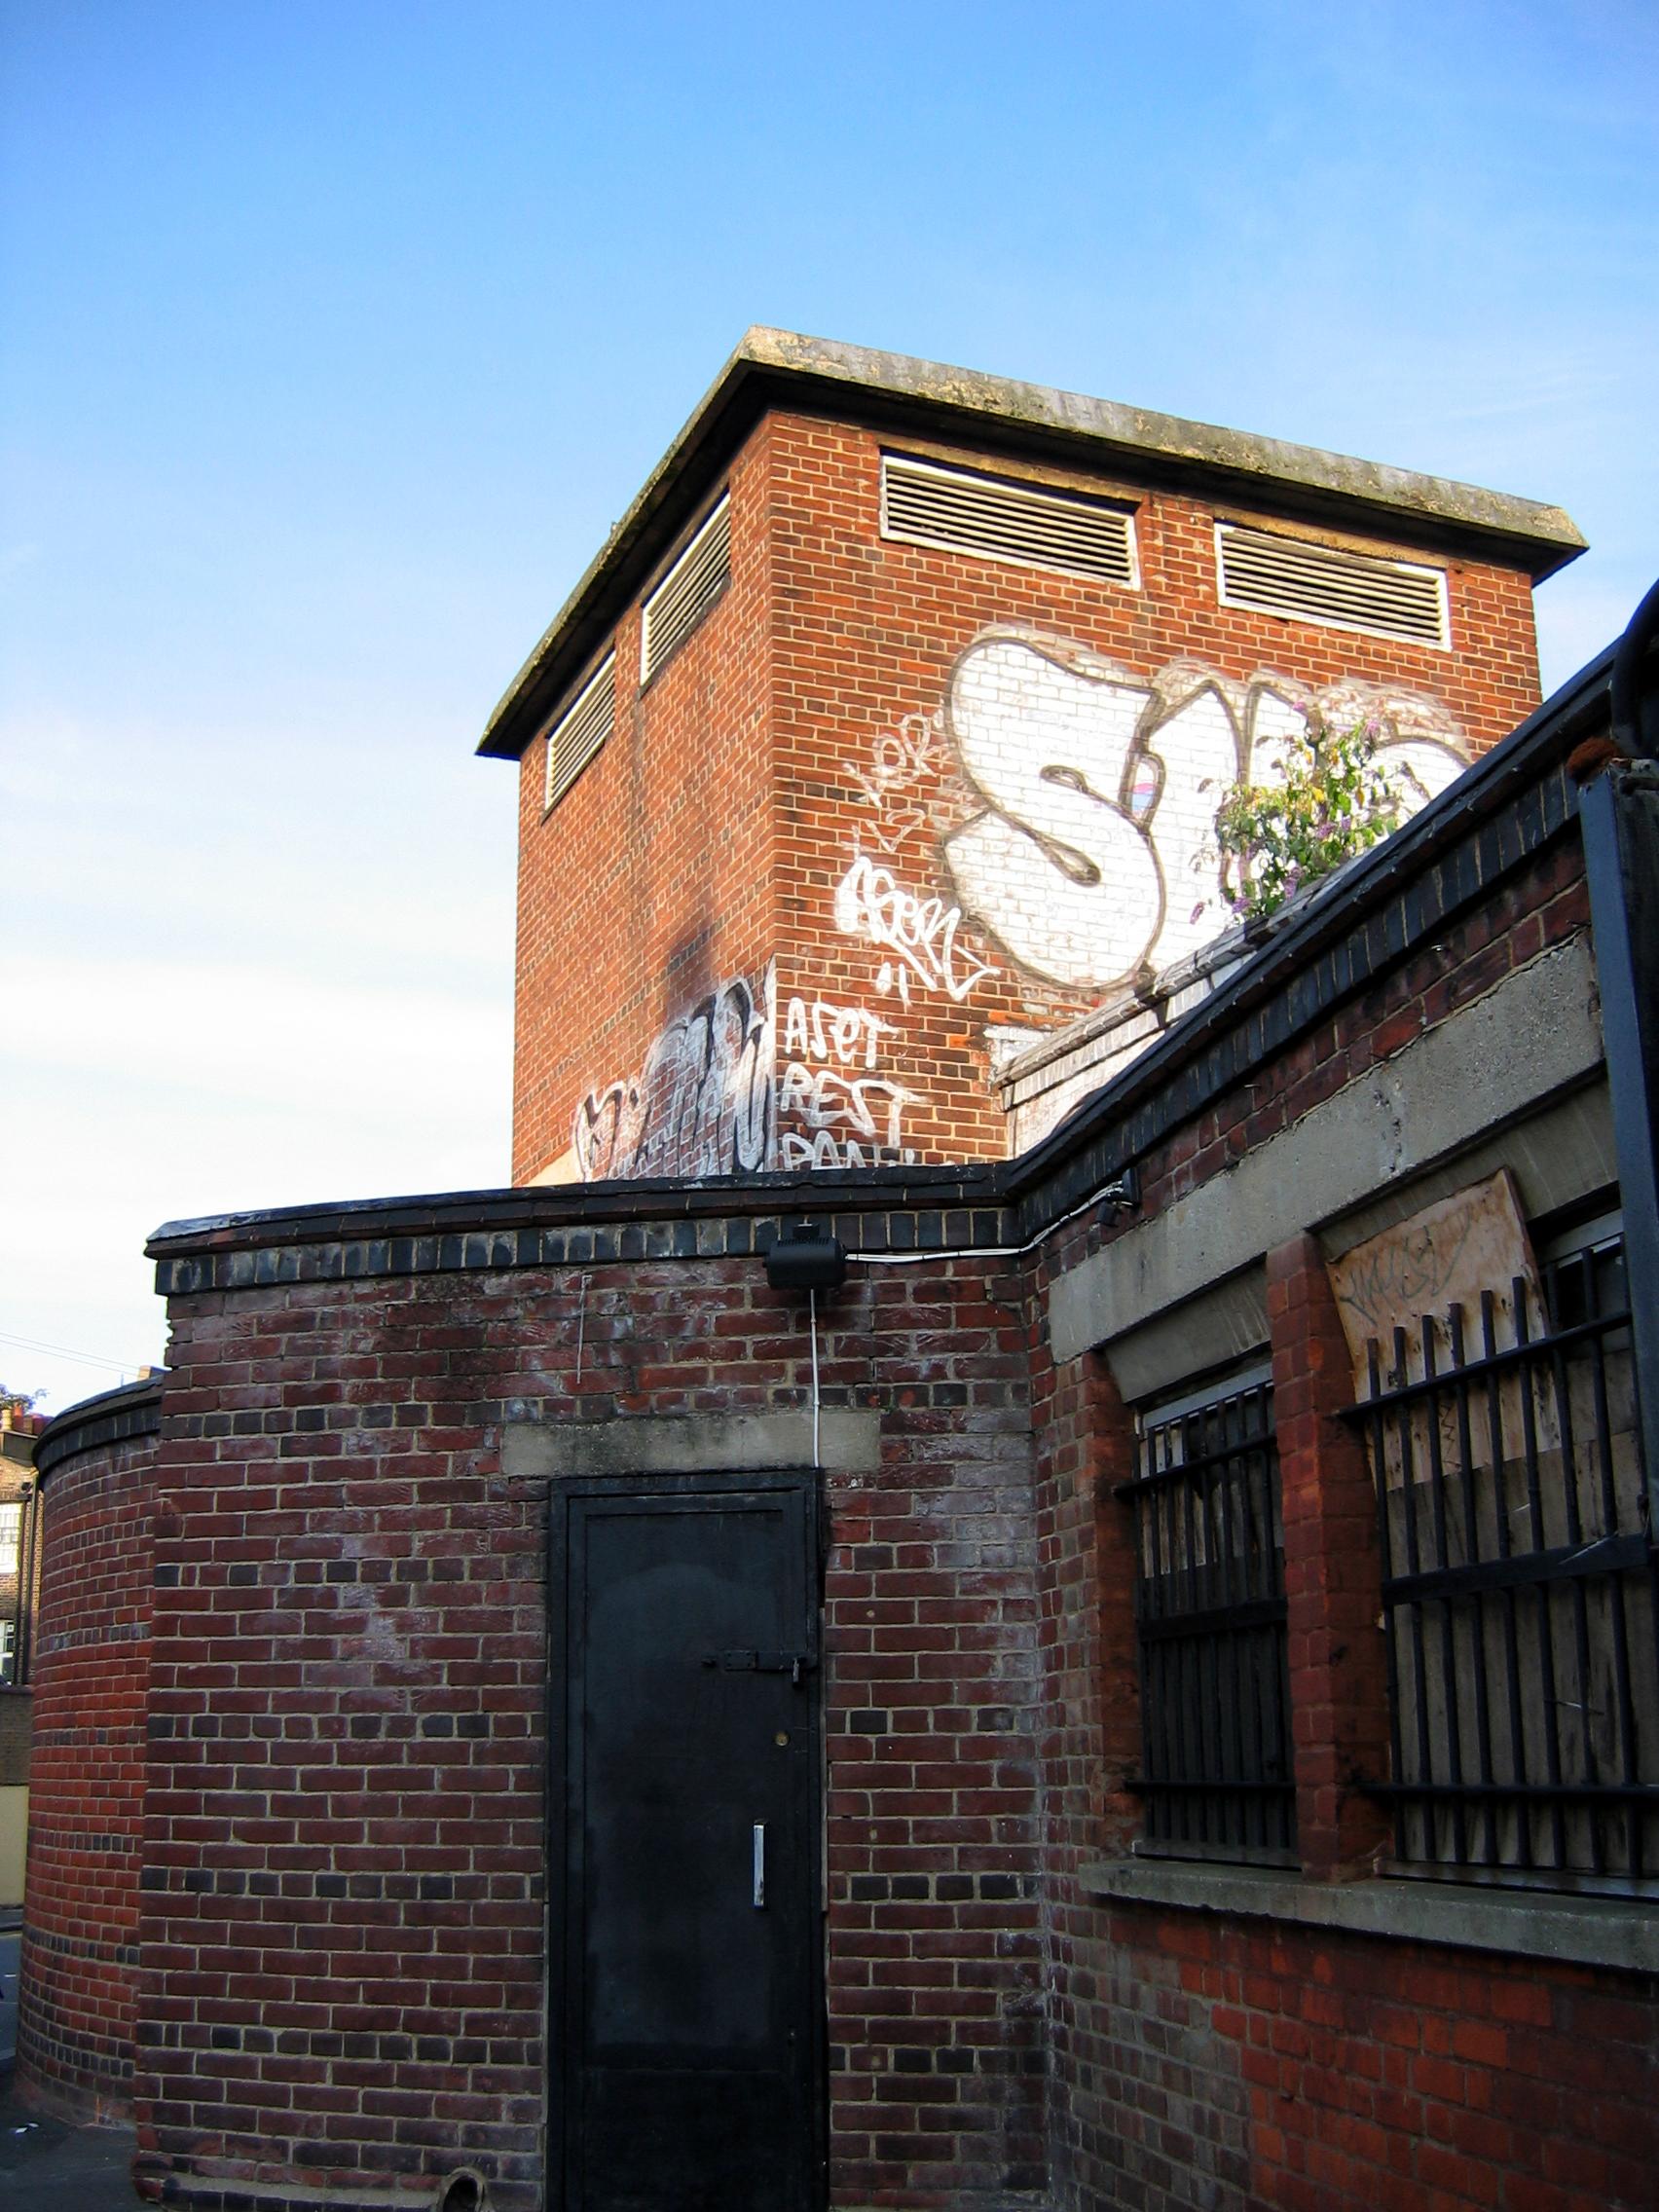 Camden Town: File:Camden Town Shelter 2.jpg